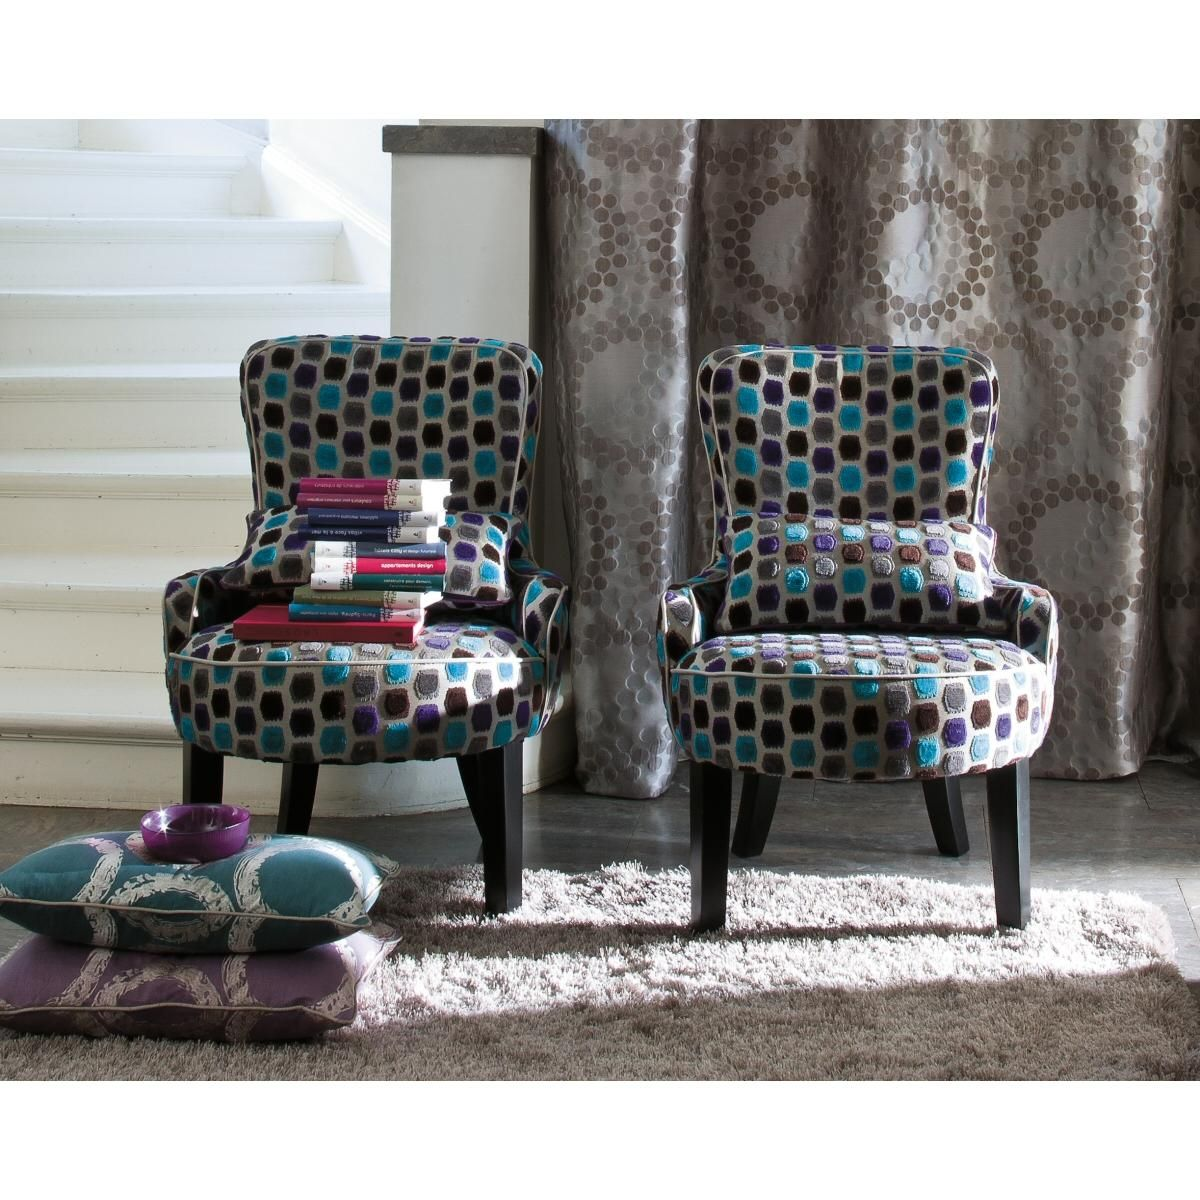 Orion de casamance | Upholstery